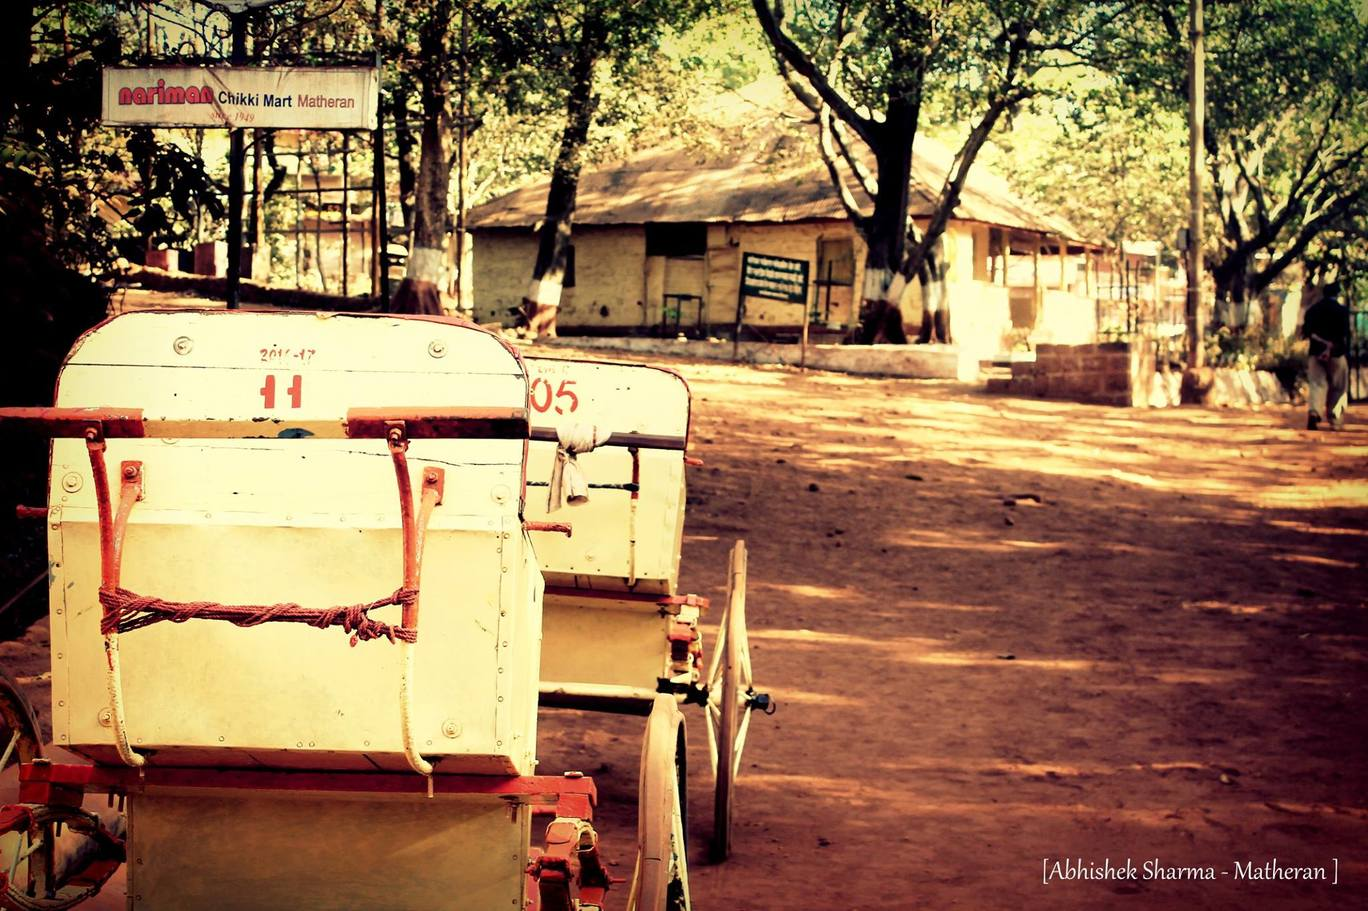 Photo of Matheran...A perfect spot for solitude By Abhishek Sharma